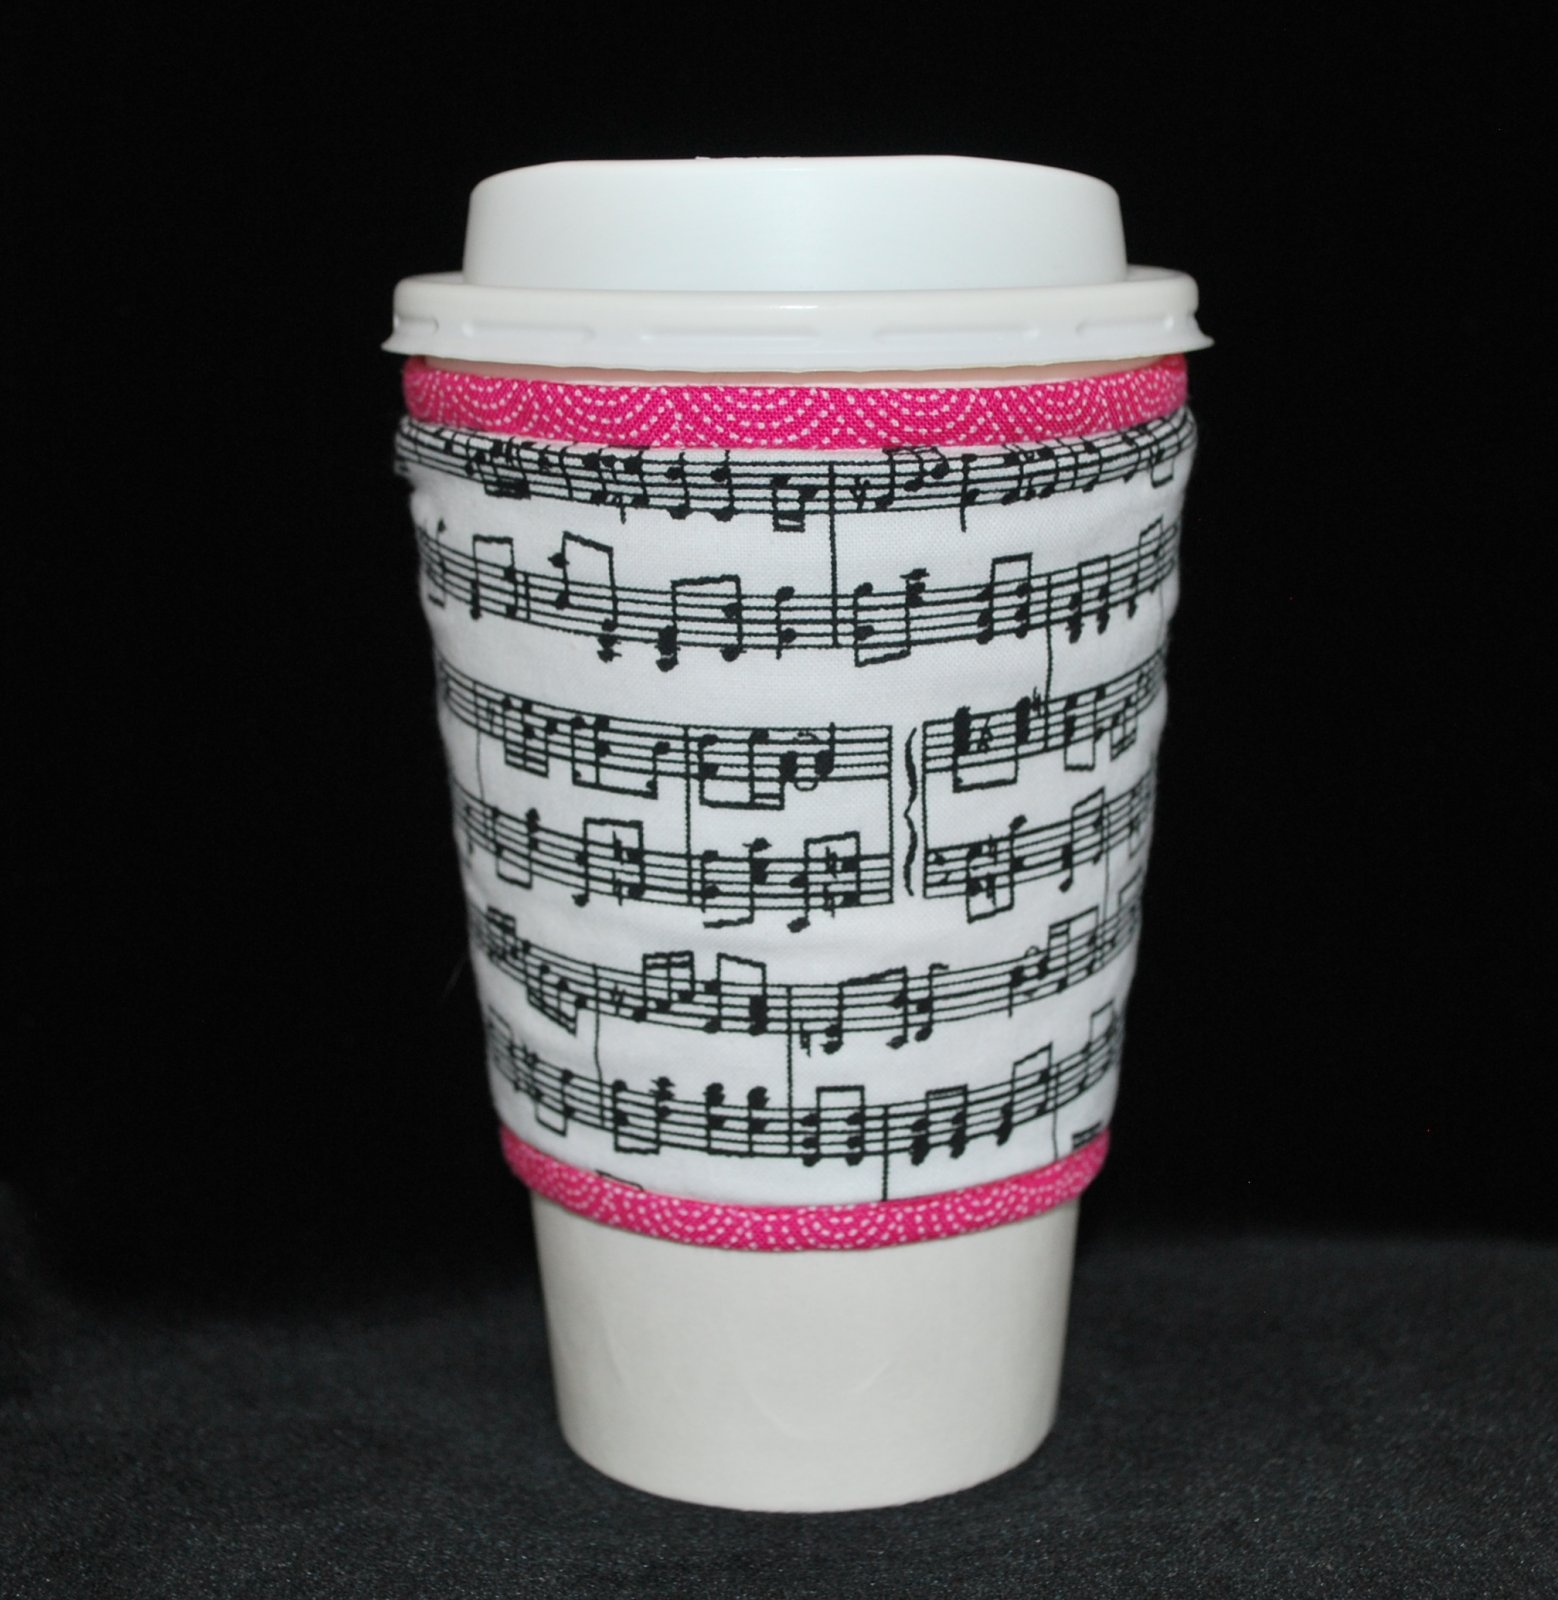 Musical score (black & white)